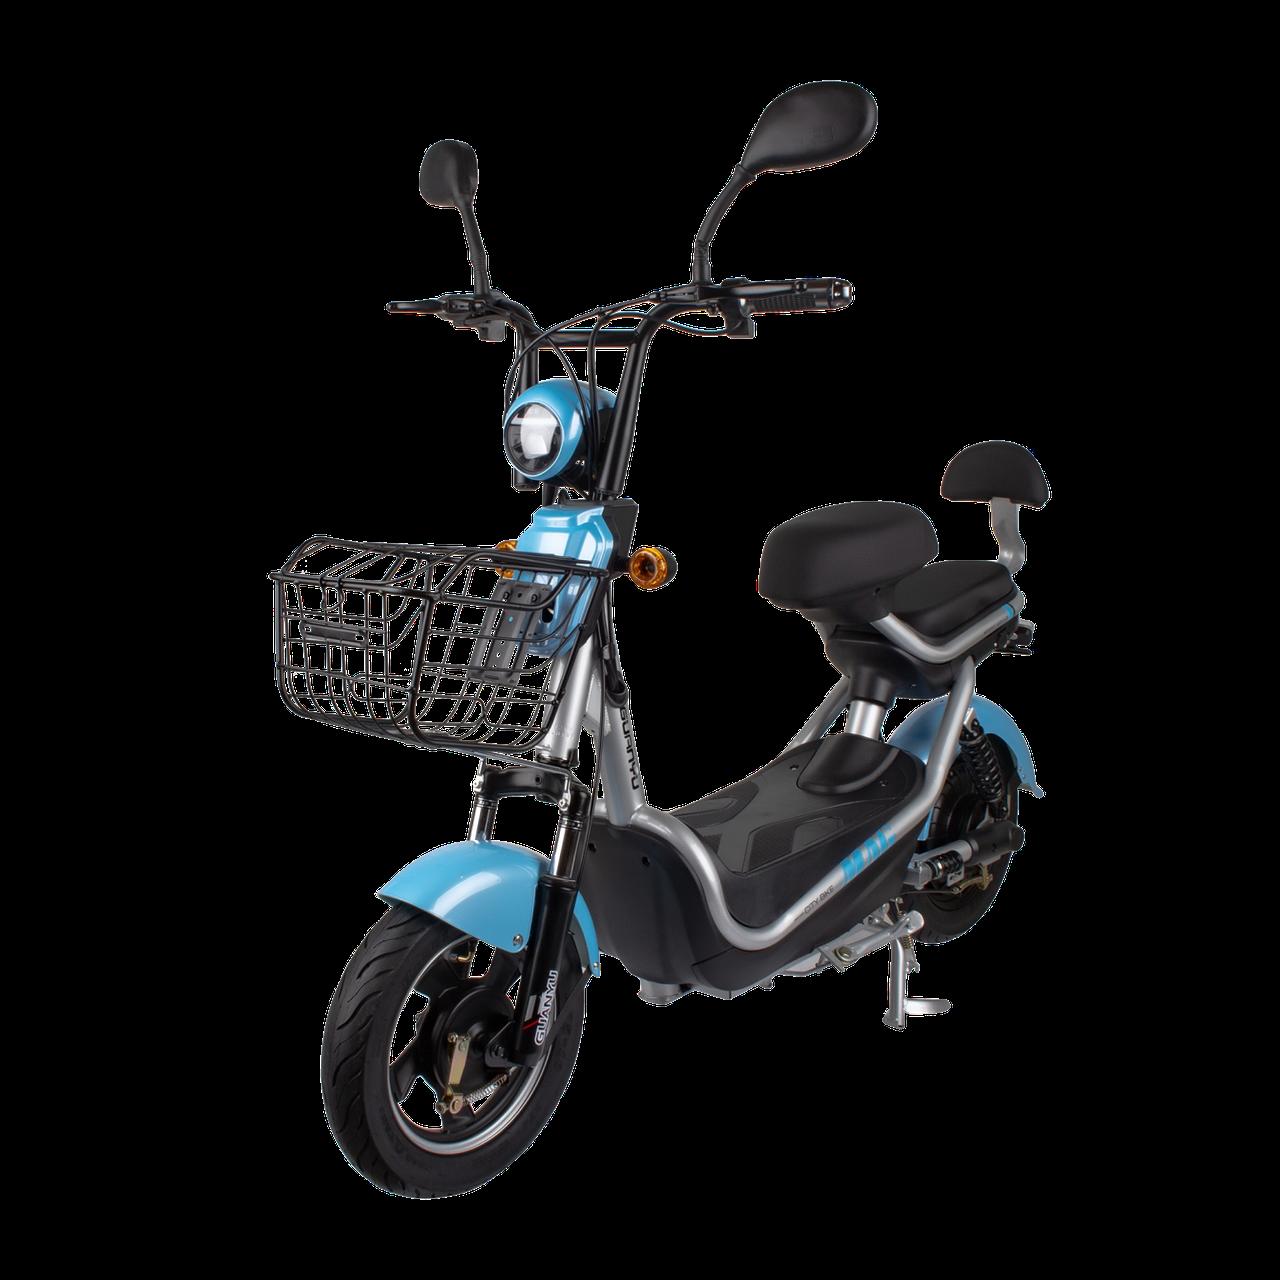 Электрический мопед  CITY gy-4 500W/48V/20AH(GL) (серо-голубой)